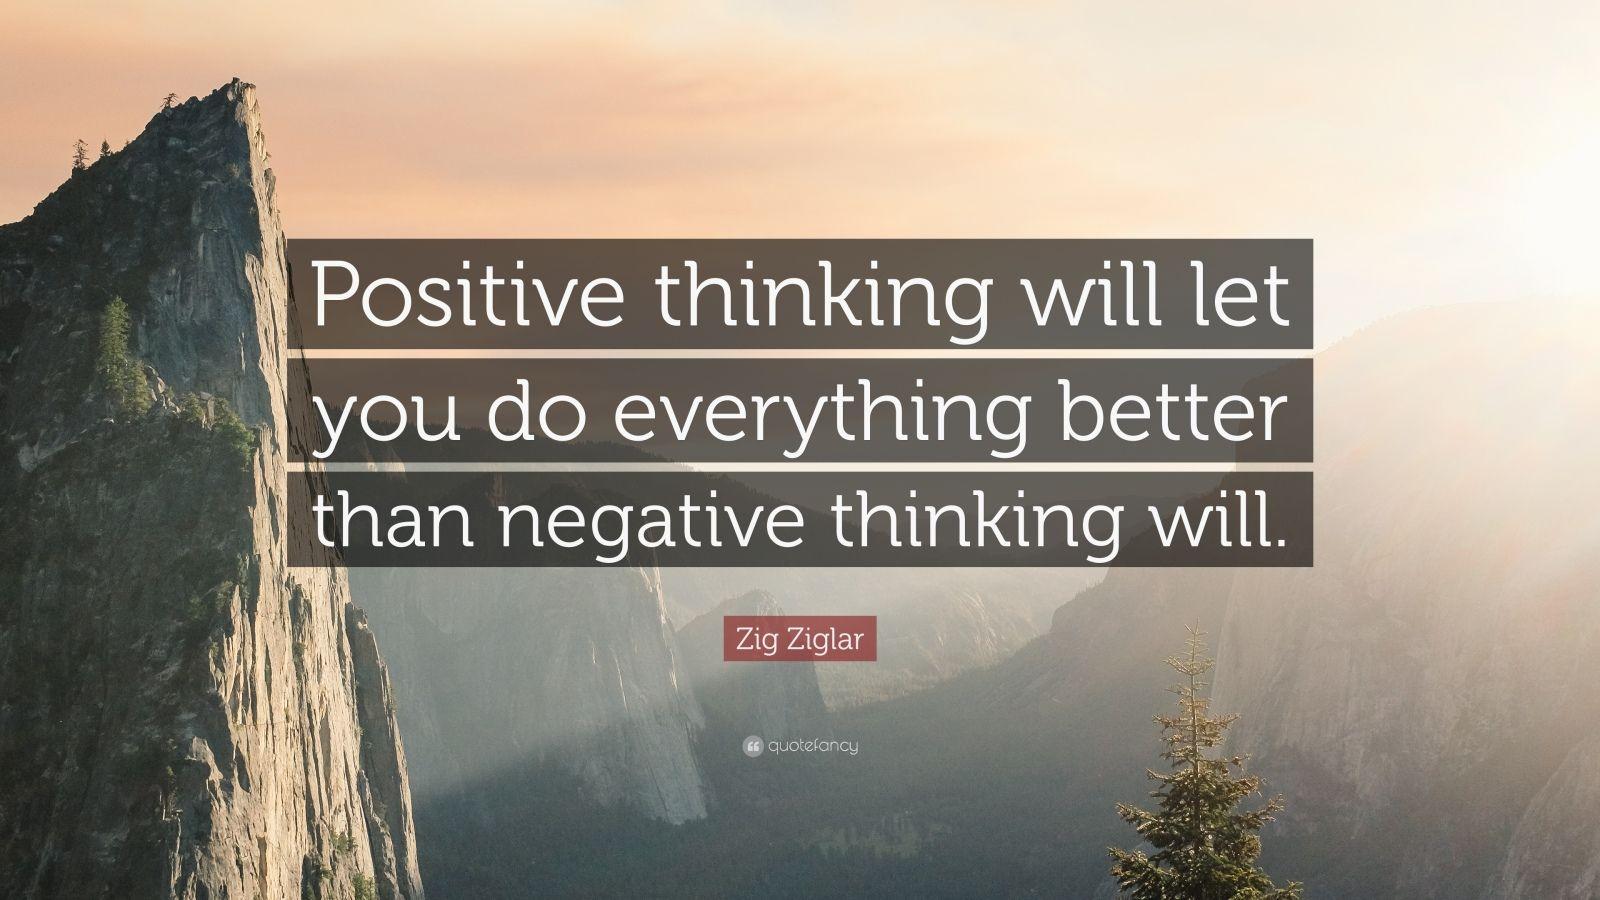 Zig Ziglar Positive Thinking Will Let You Do Everything Better Than Ne...